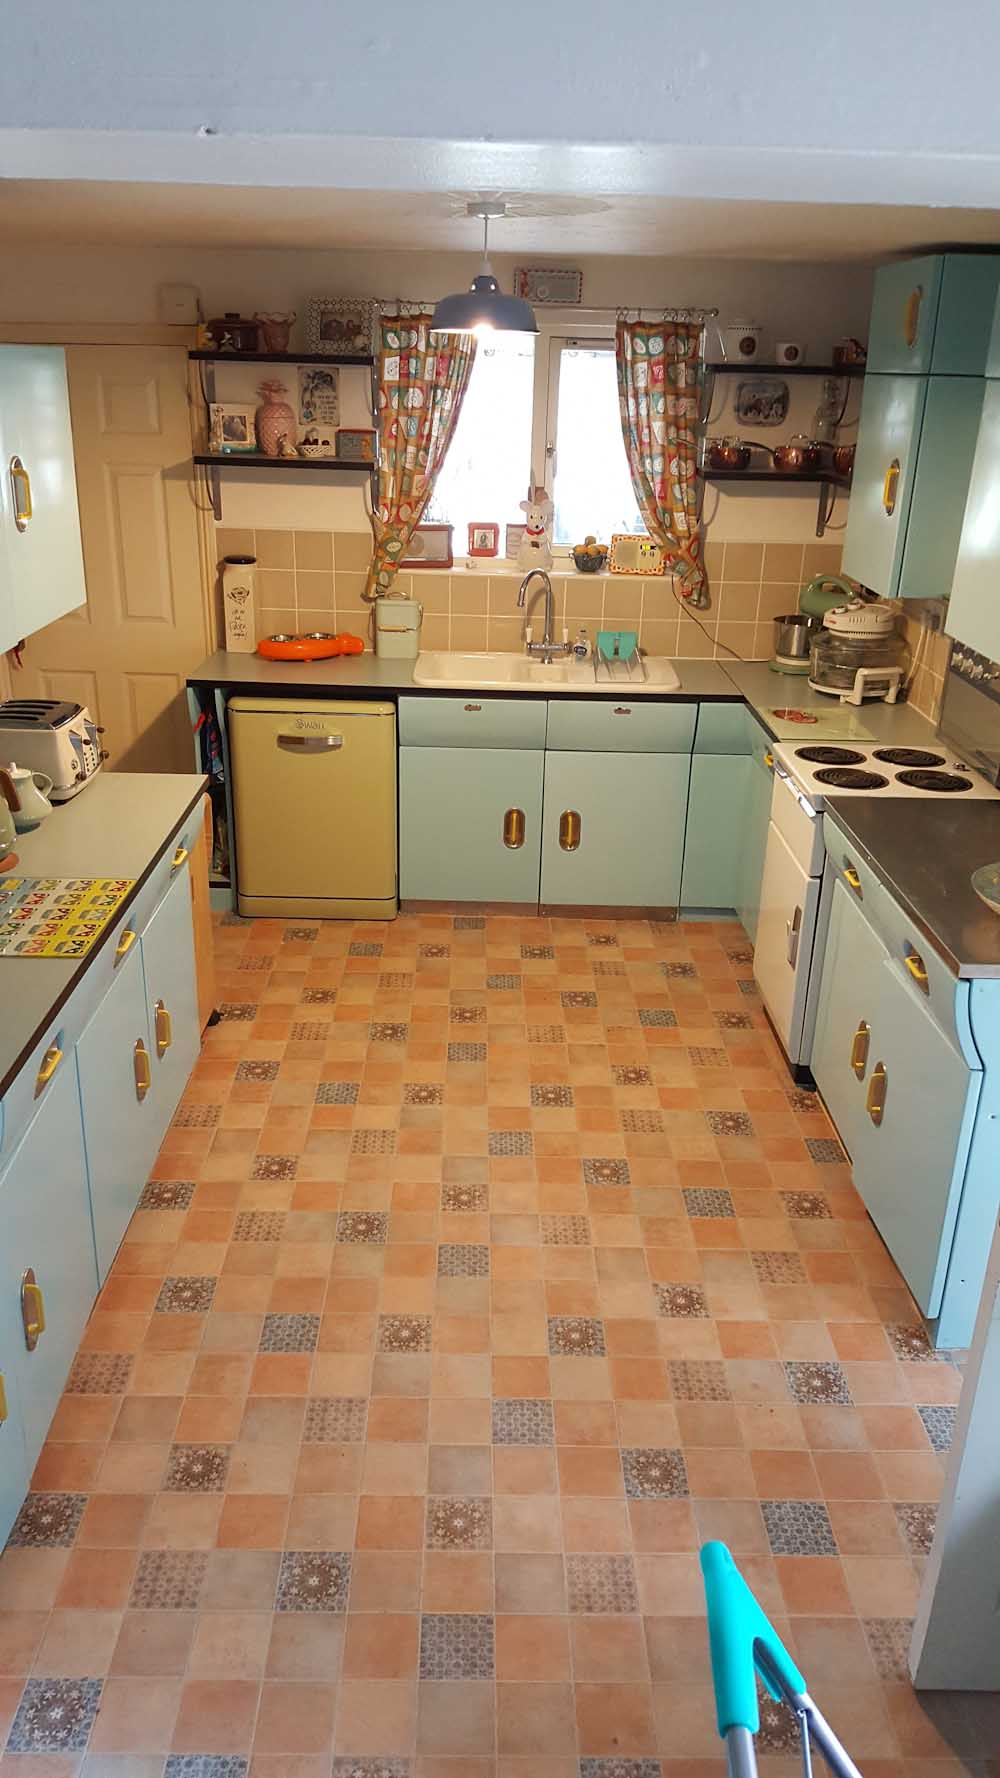 steel kitchens Archives - Retro Renovation